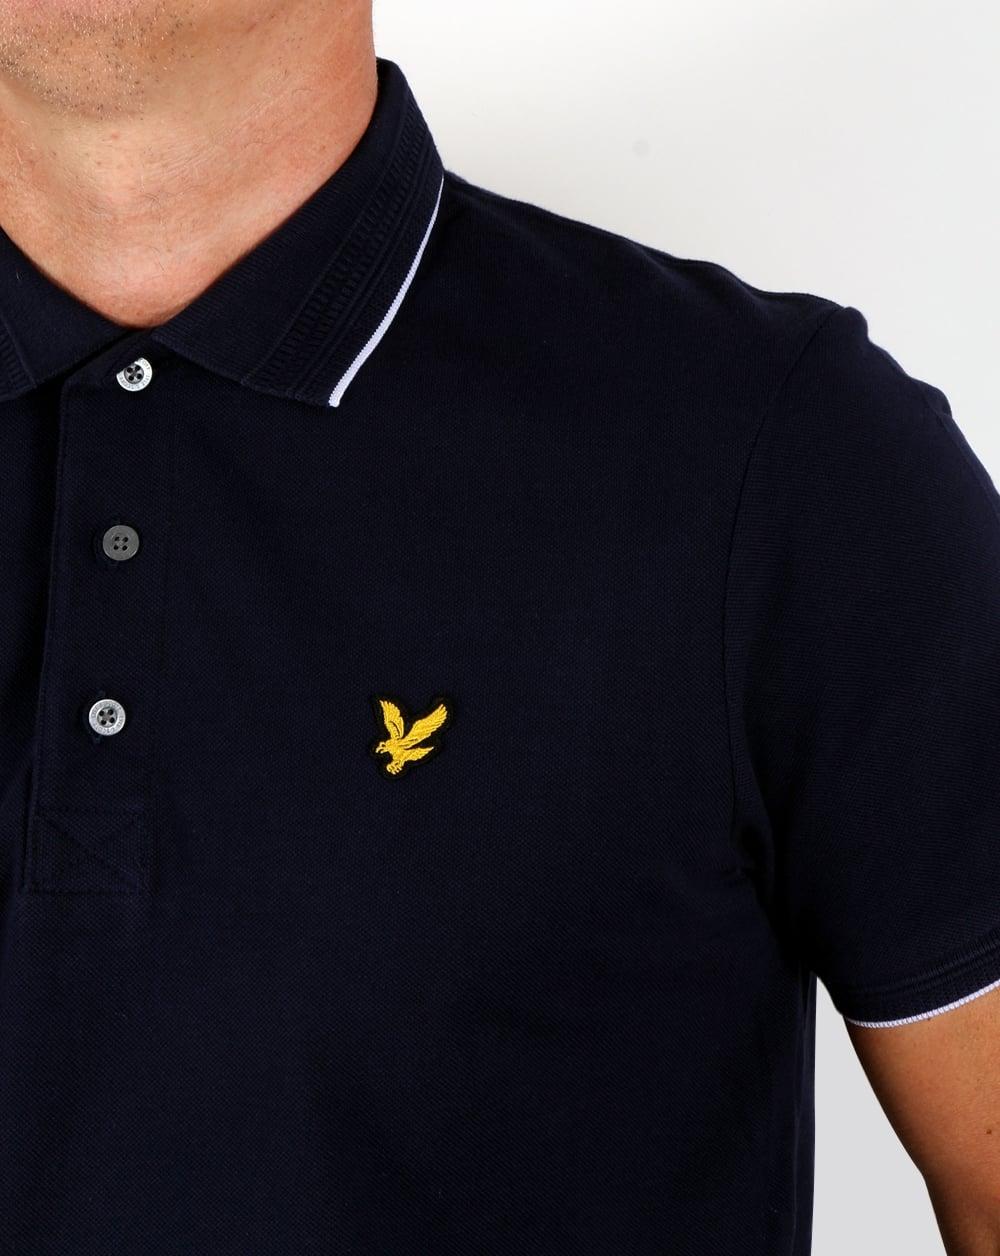 Lyle And Scott Jacquard Collar Polo Shirt Navy Men 39 S